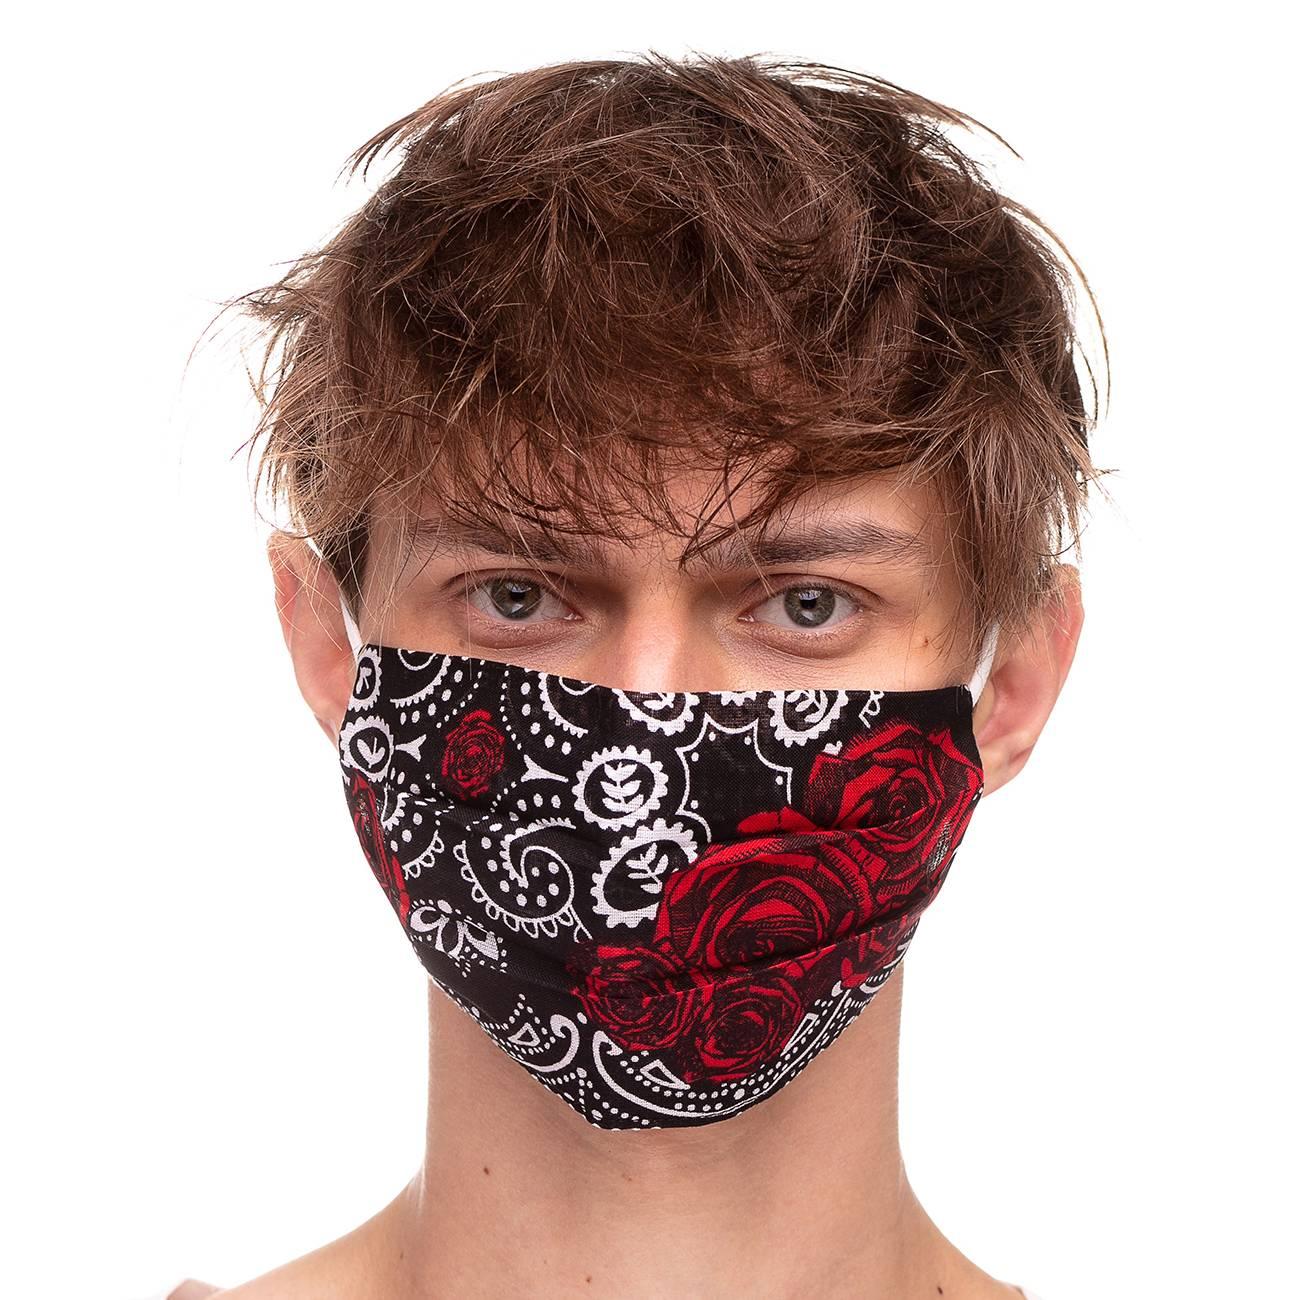 Masca Pm2.5 Trandafirii -ADULT M Be Aware imagine 2021 bestvalue.eu